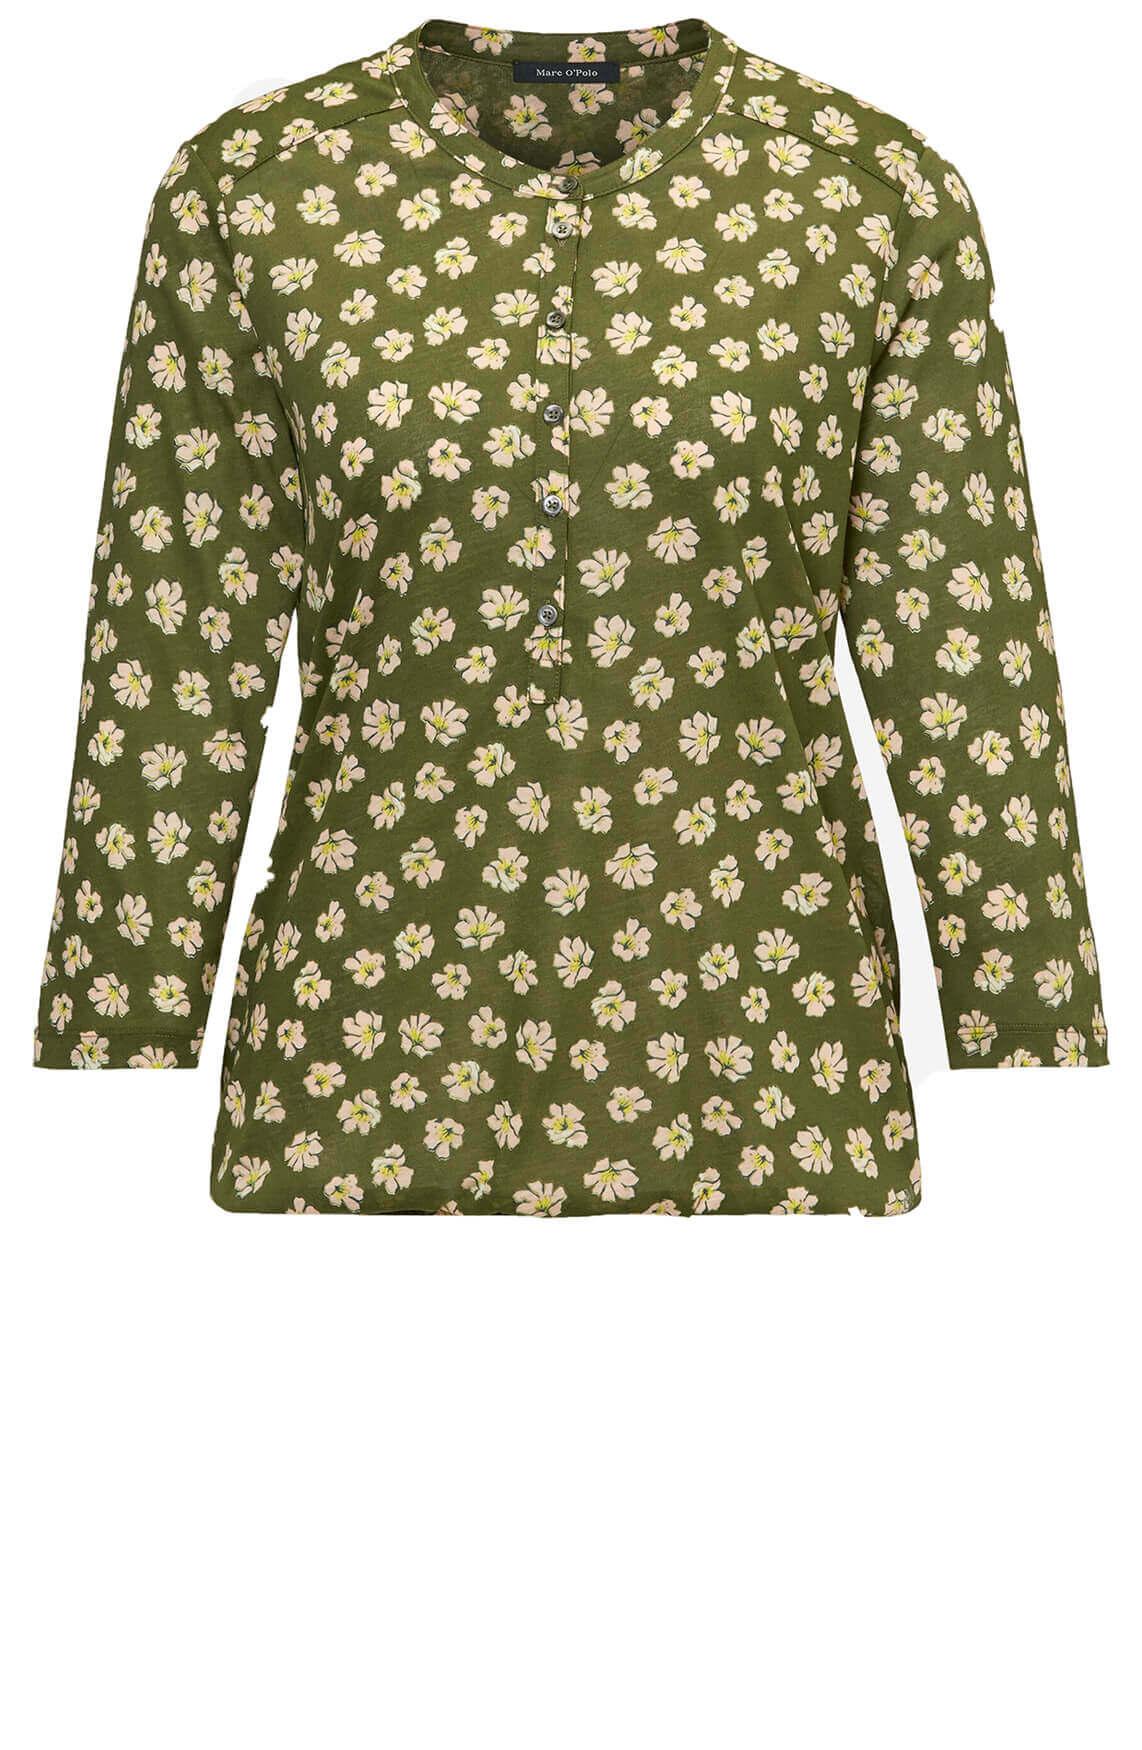 Marc O'Polo Dames Shirt met bloemen groen